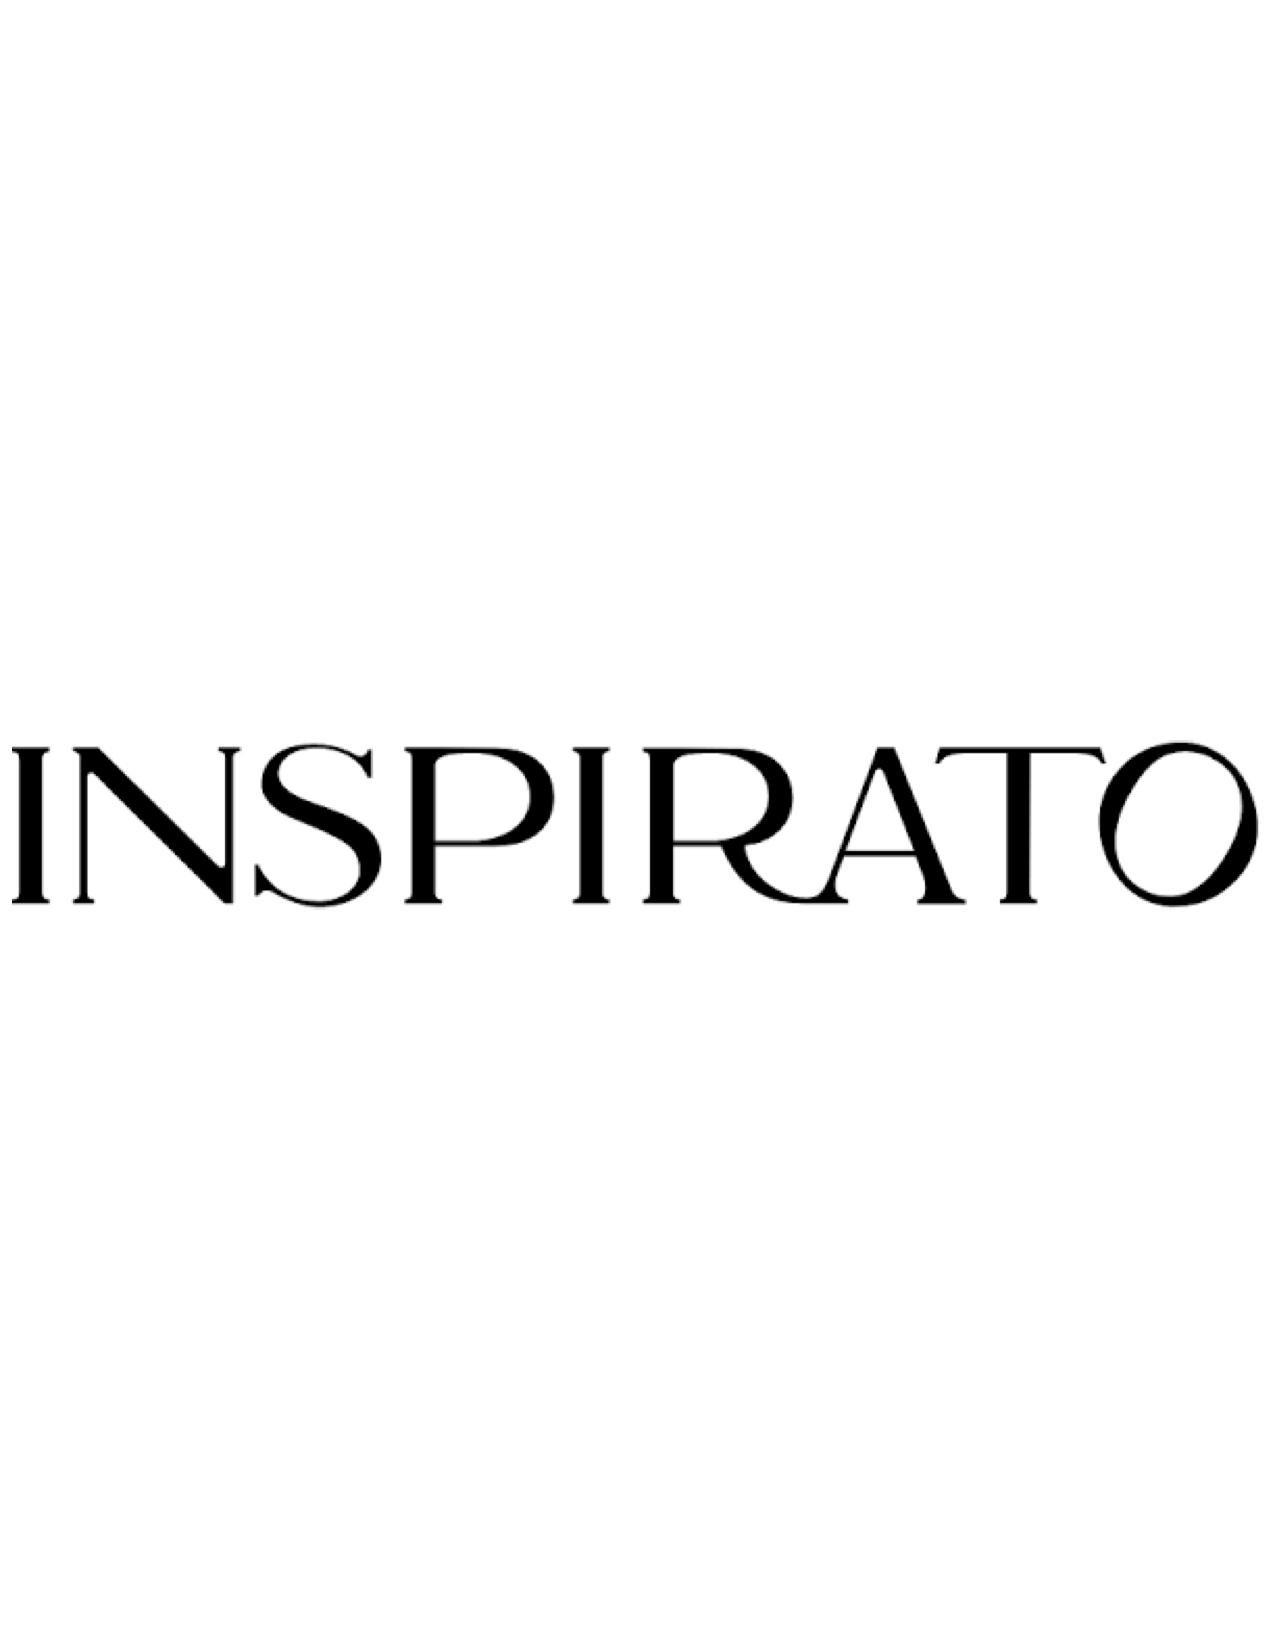 inspirato logo.jpg